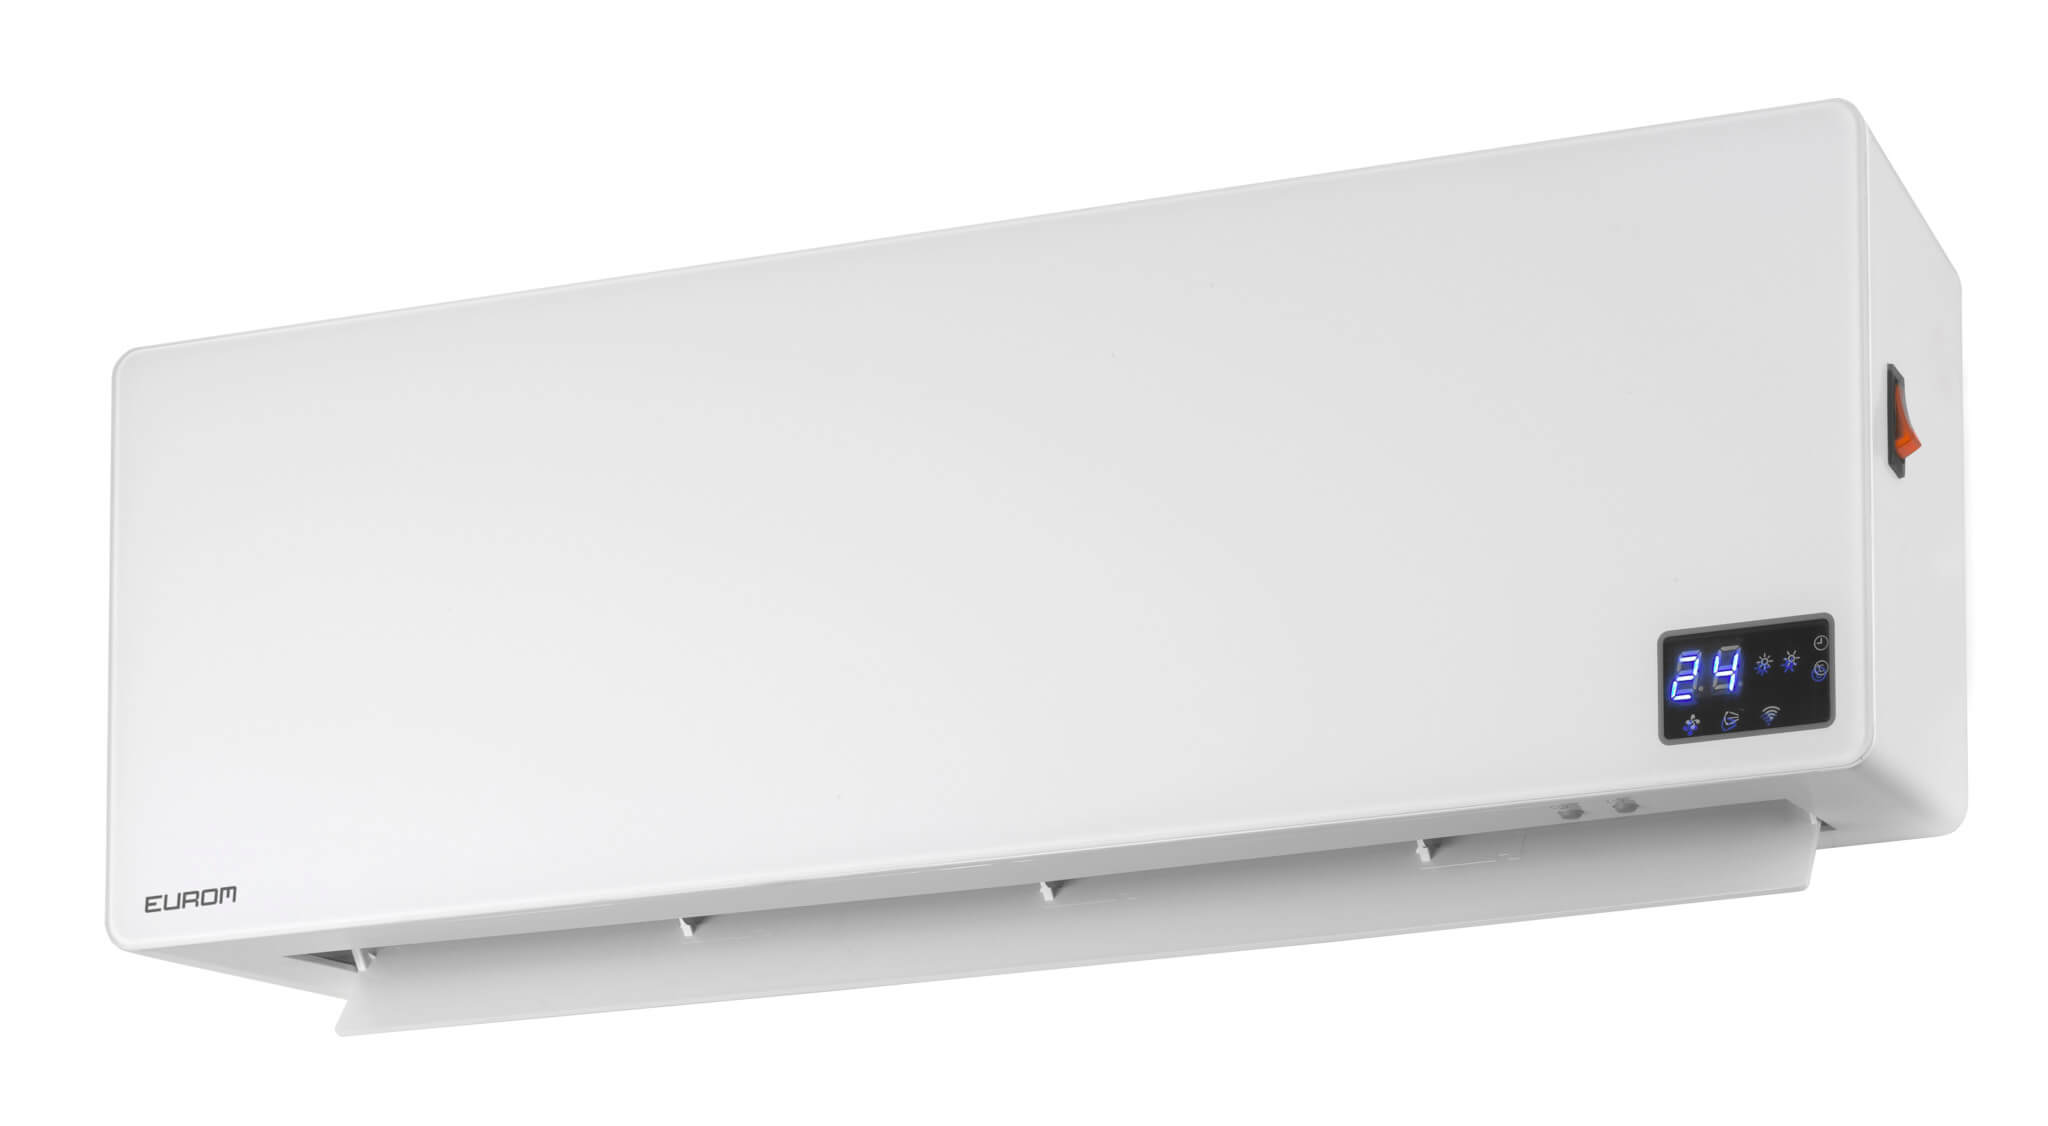 Eurom Wall Designheat 2000 WiFi Elektrische verwarming 2000W | Met afstandsbediening en WiFi (wh2000r)